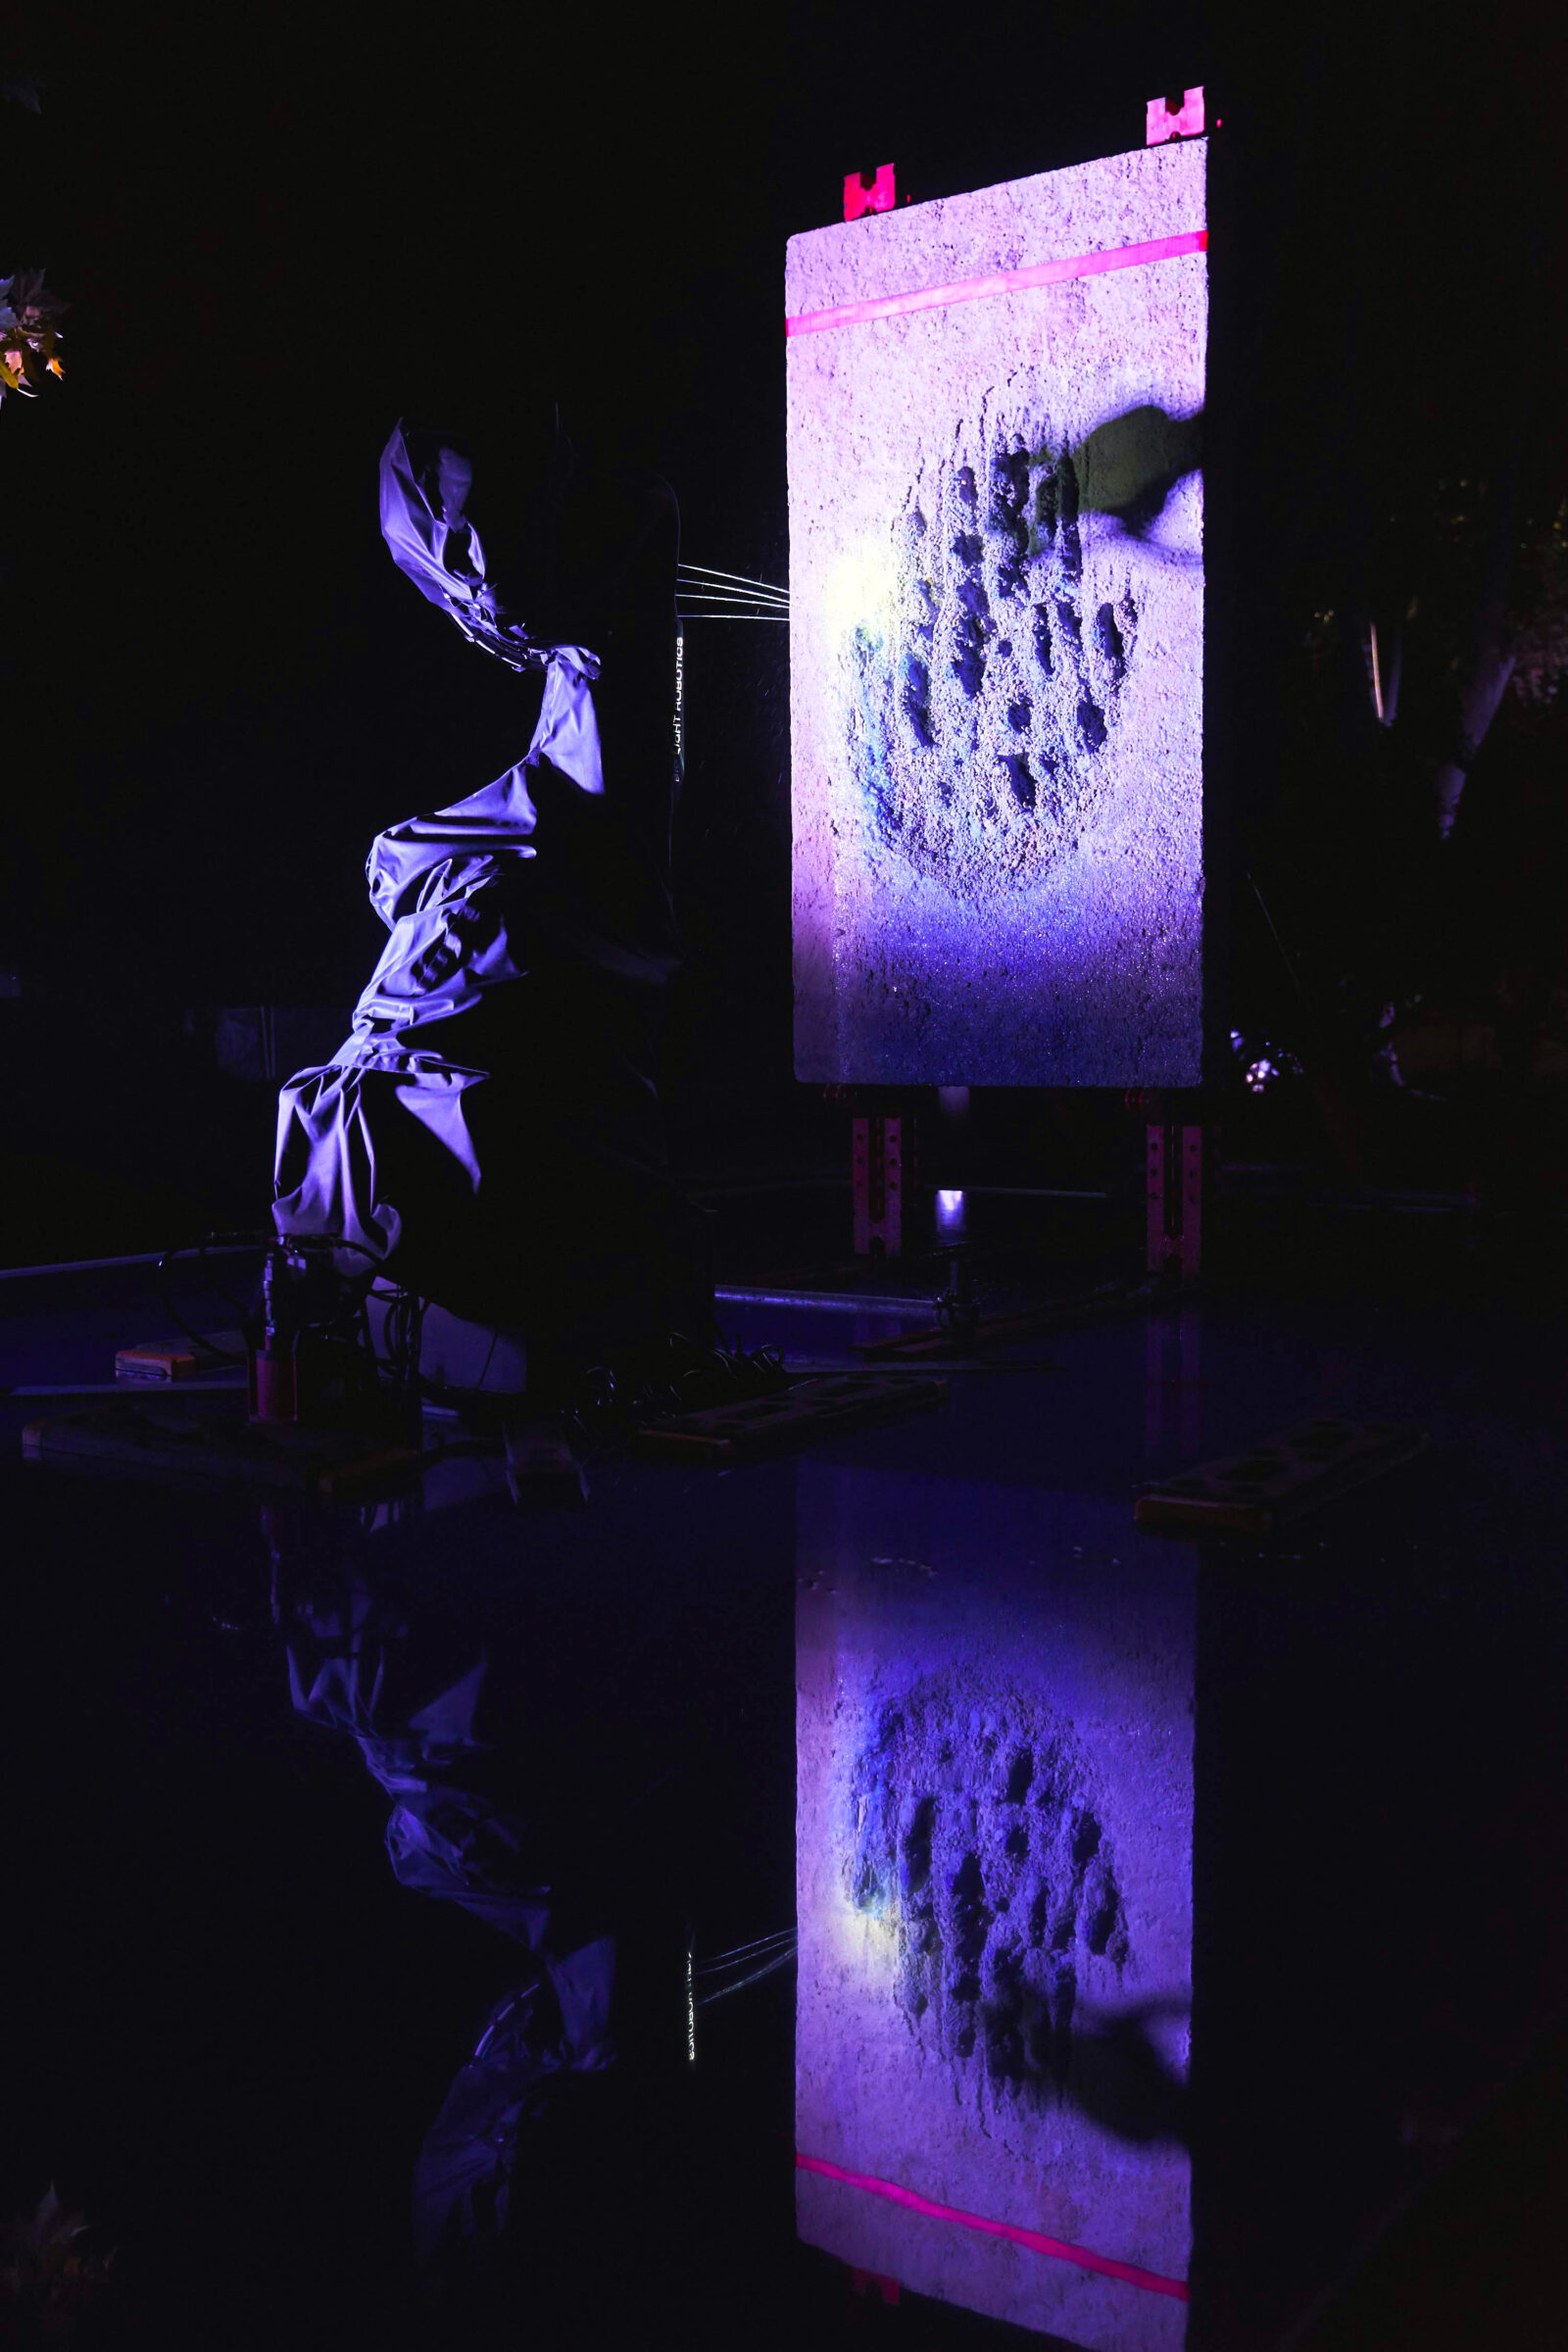 Federico Díaz, BIG LIGHT <br> I Am Leaving the Body